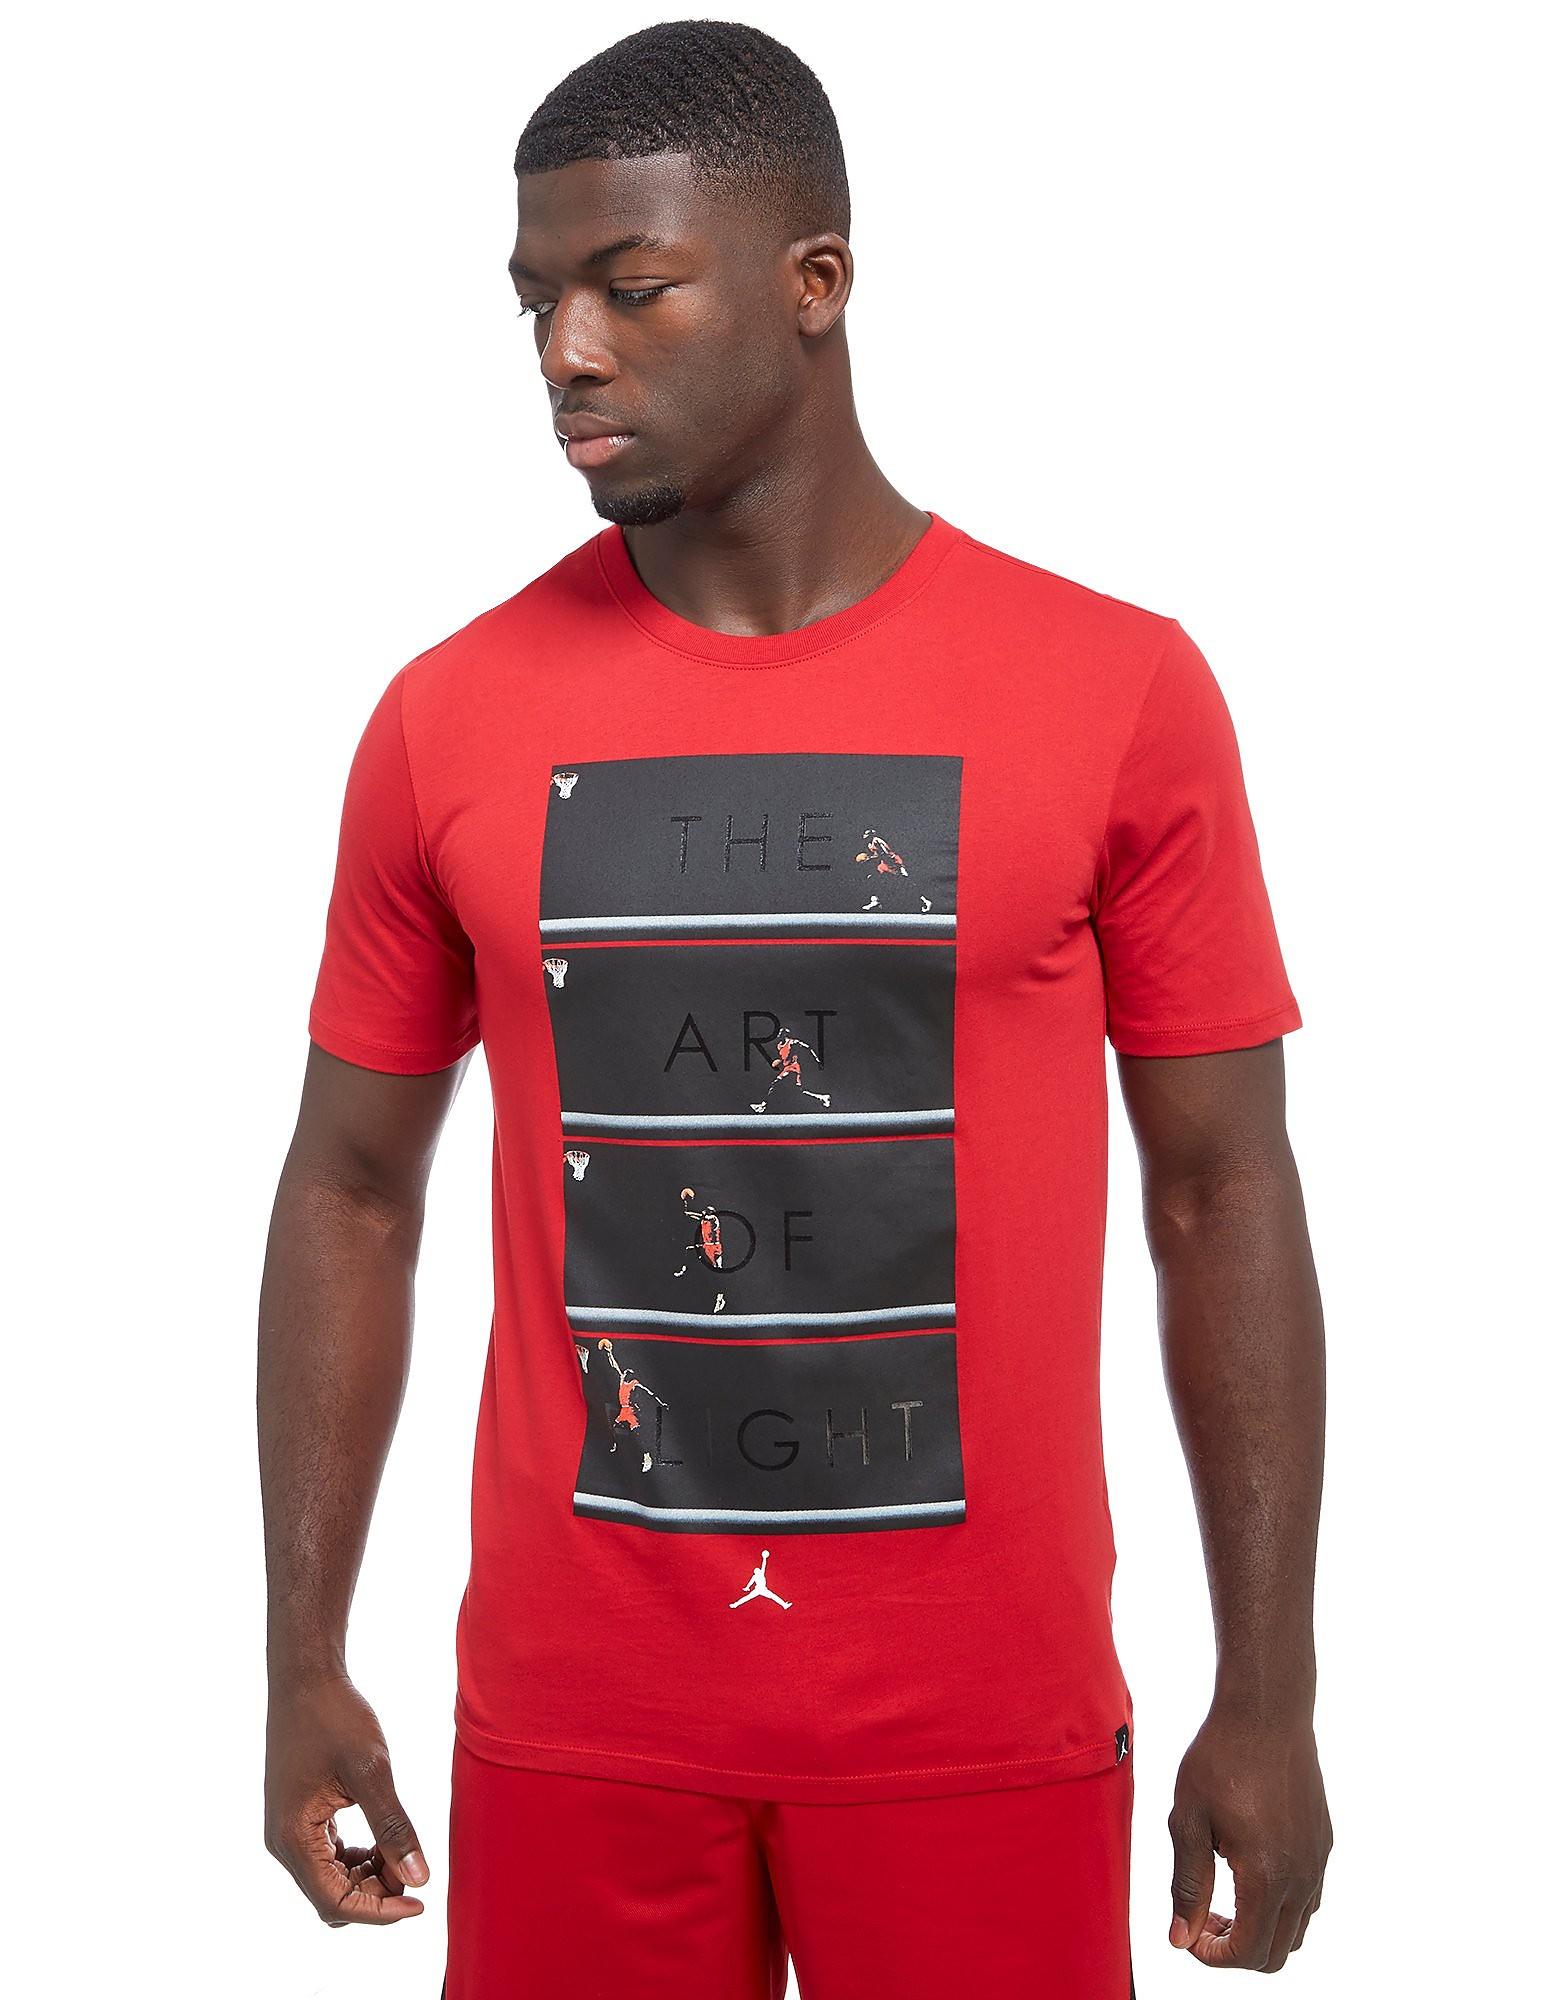 Jordan Art of Flight T-Shirt